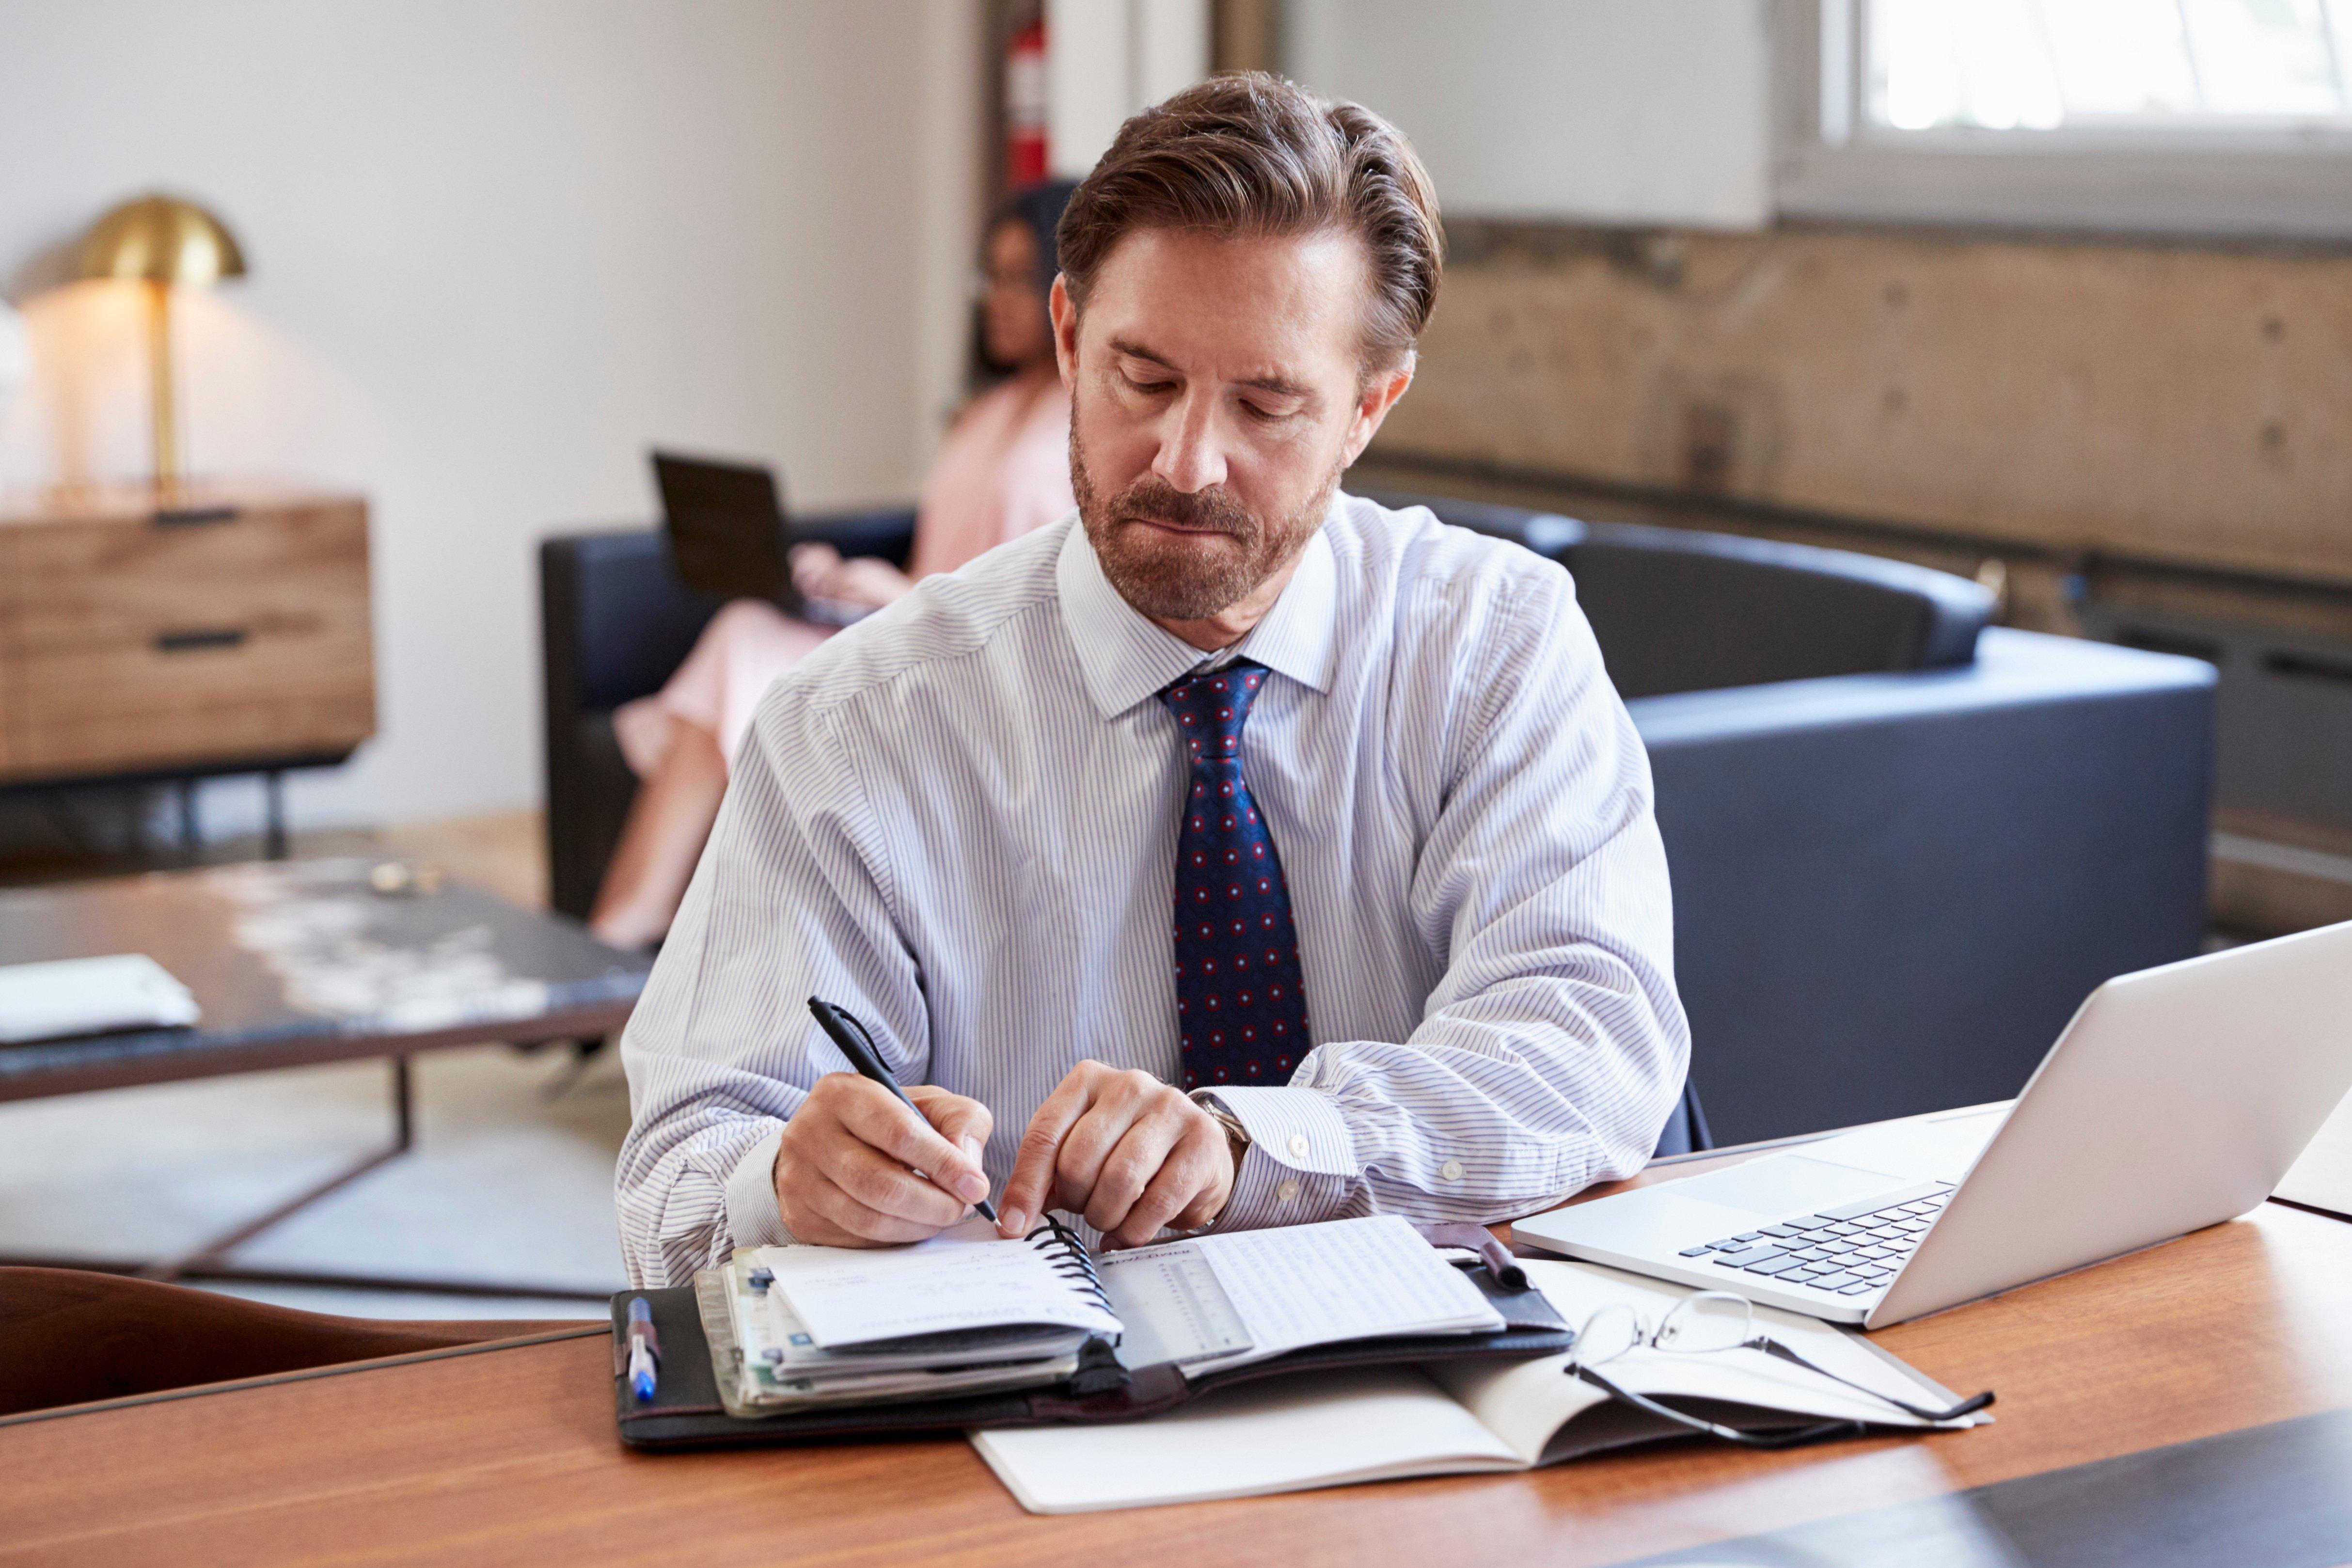 businessman-at-desk-writing-notes-P9ENRHD